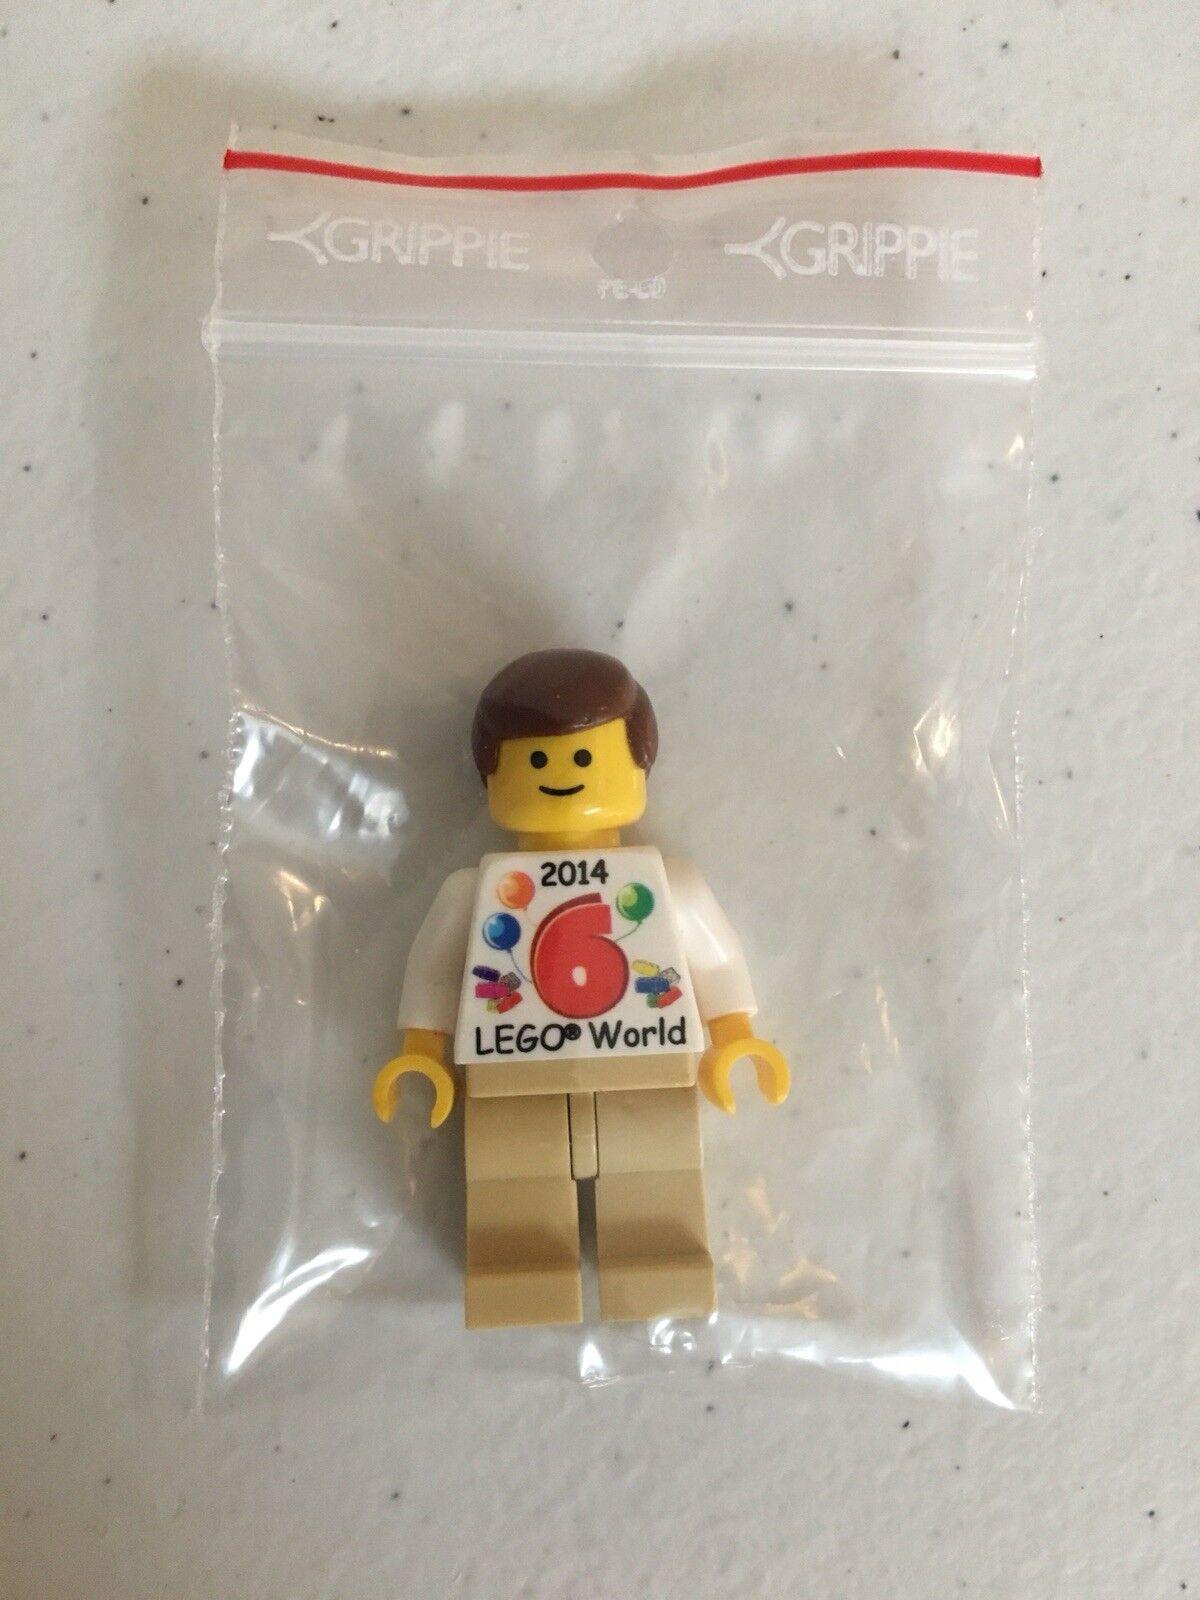 LEGO Rare LEGO Promo Exclusive Denmark Figure w  Torso LEGO WORLD 2014  6